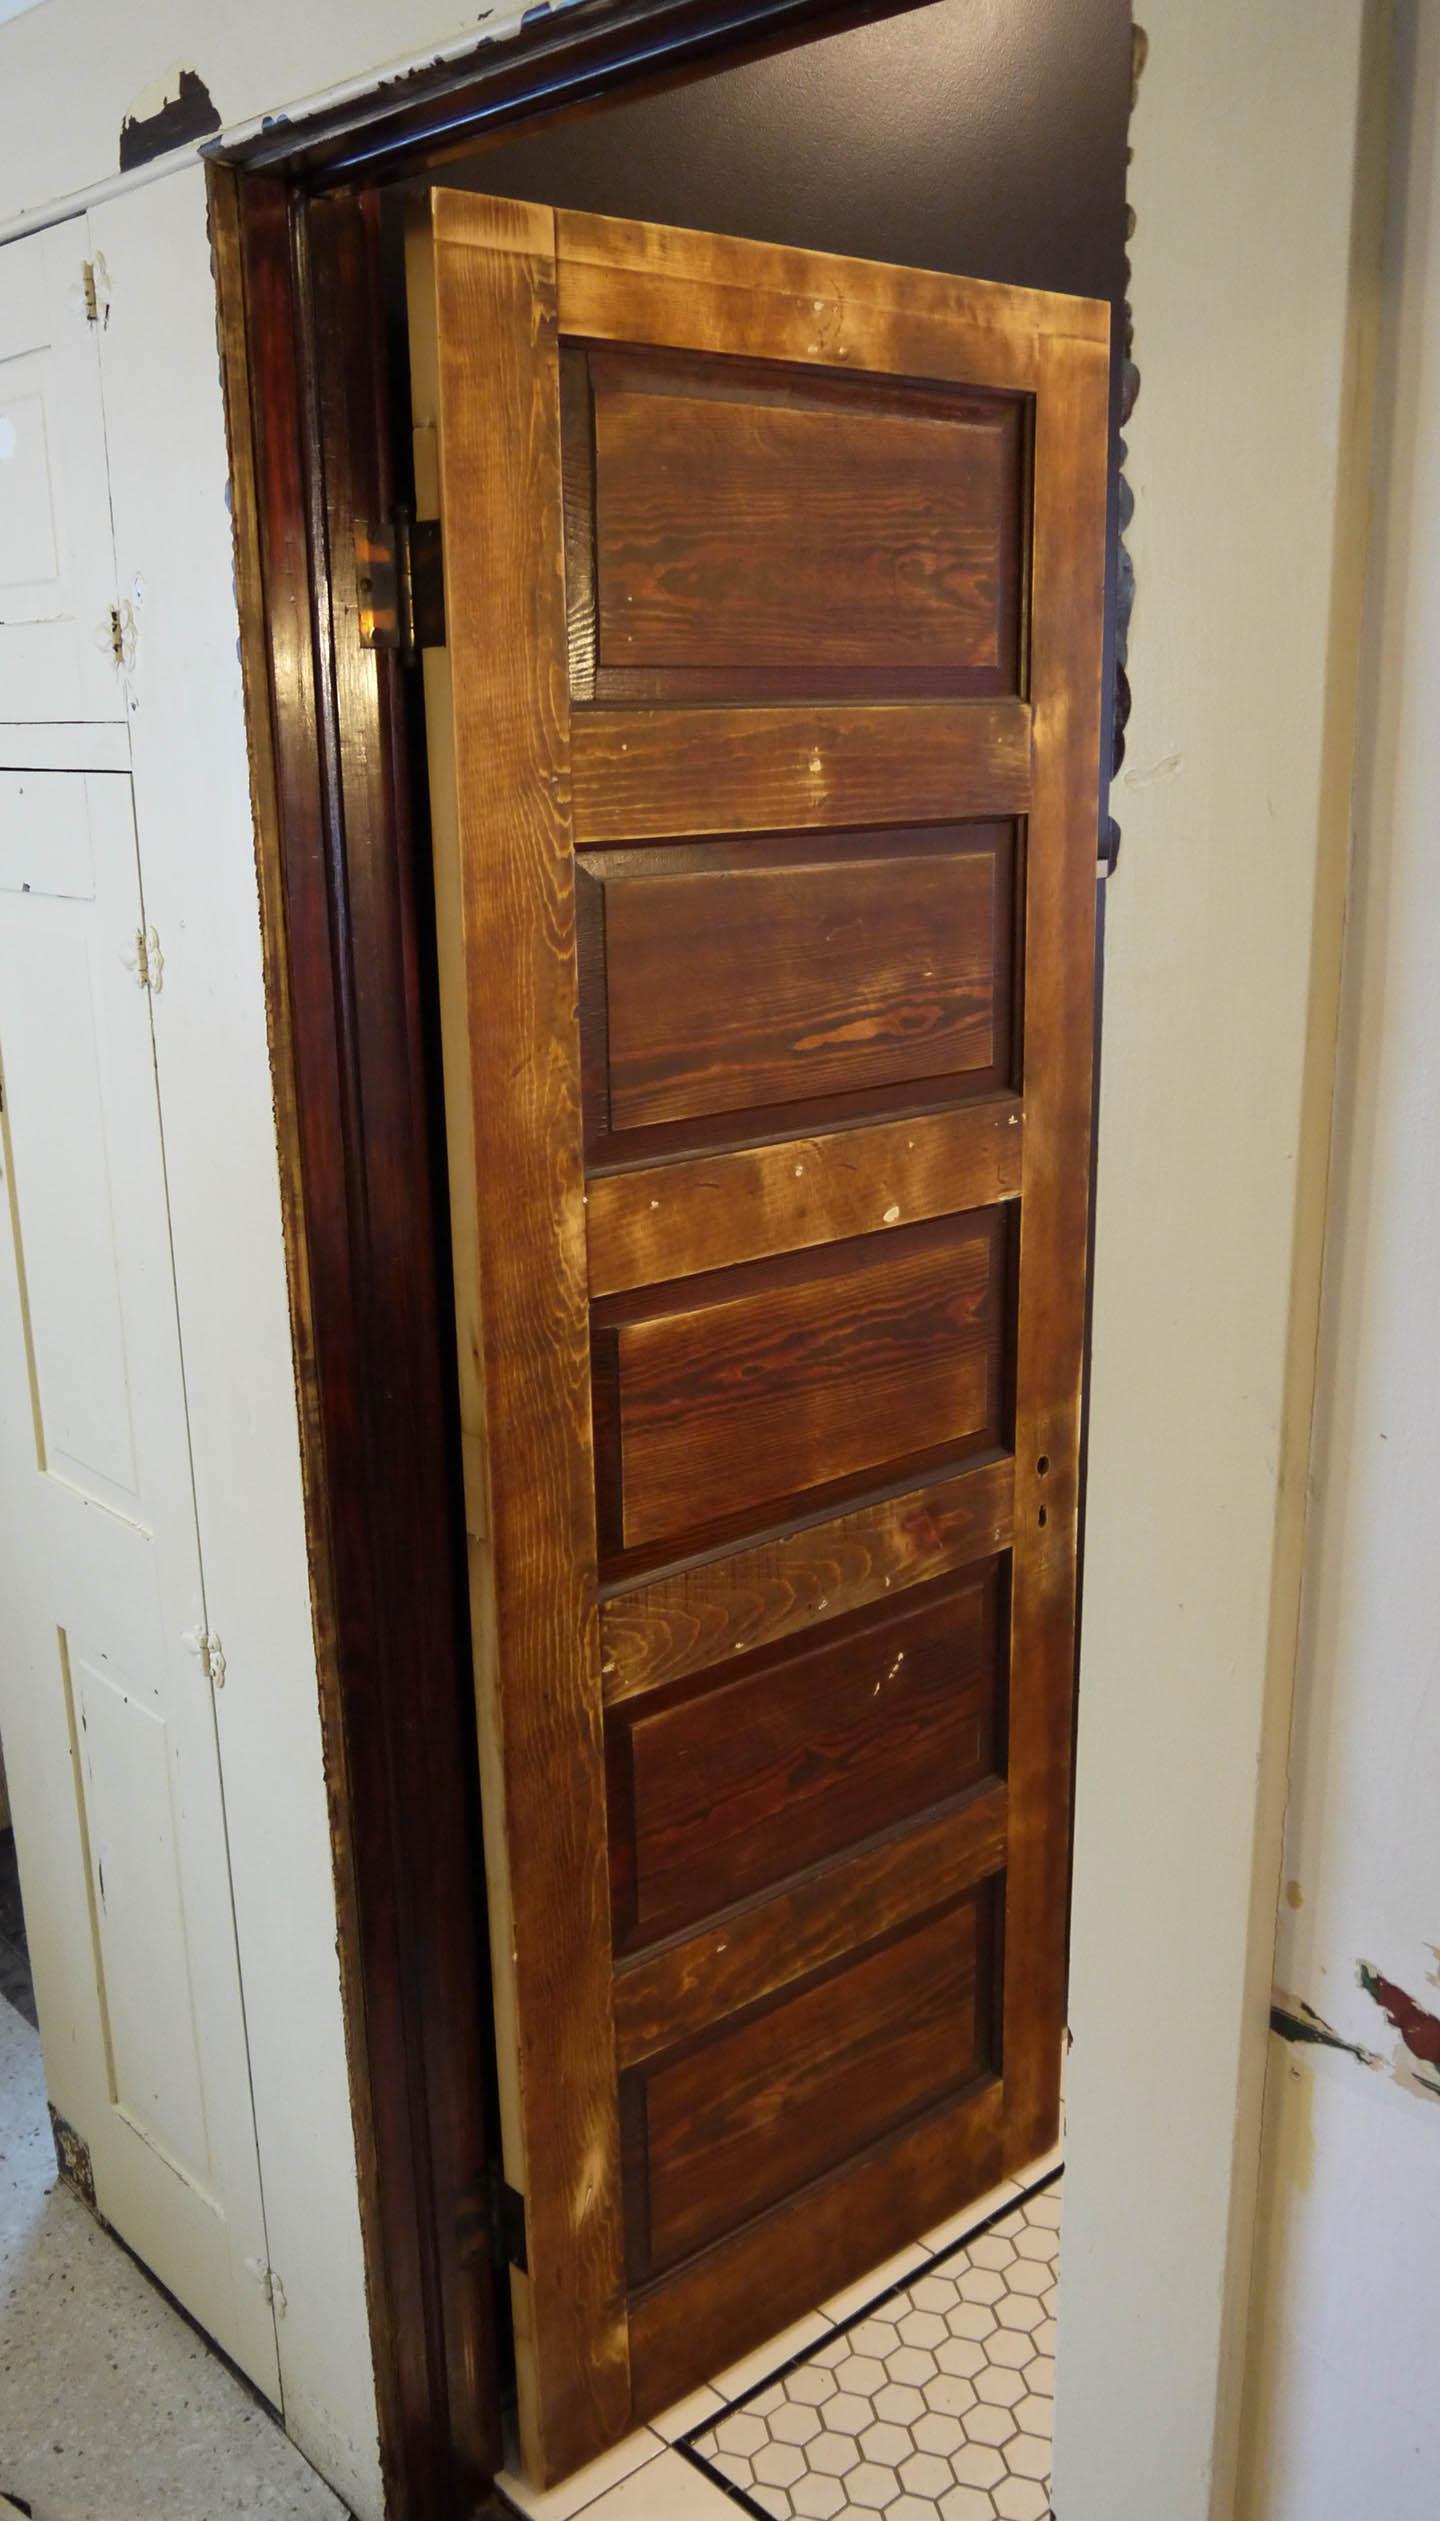 Hinge Up And Adam Ries - Bathroom door hinges